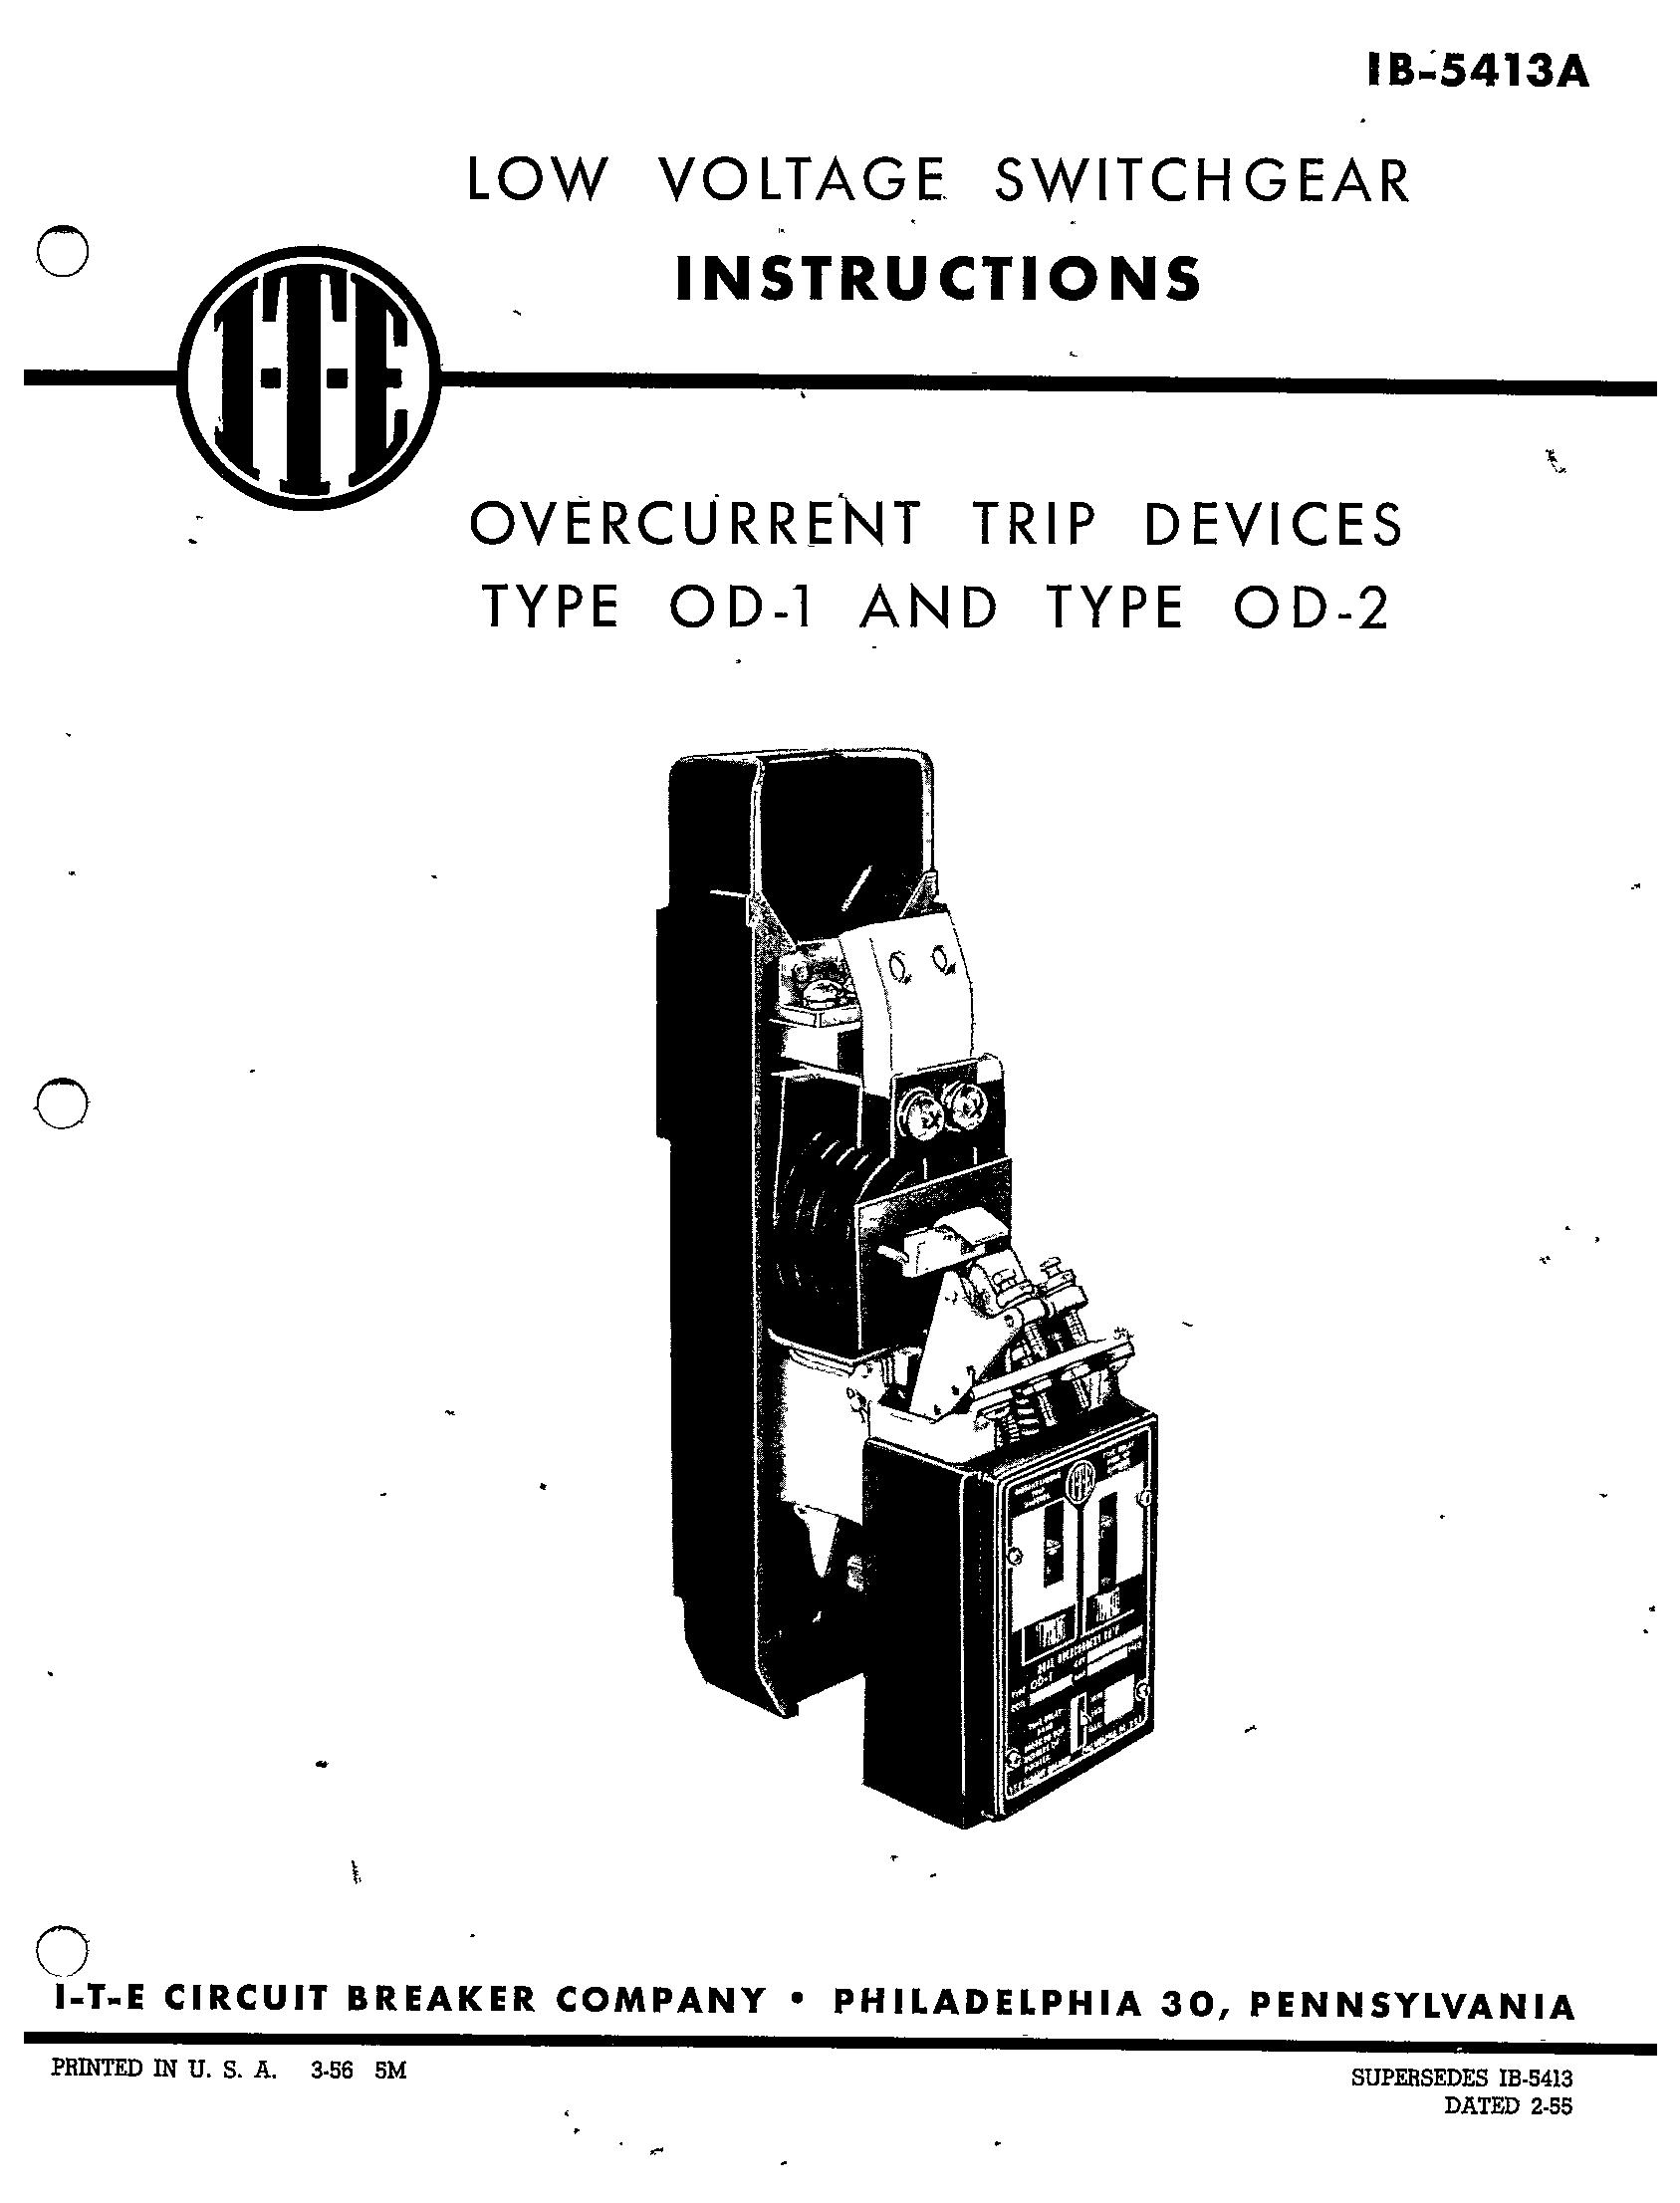 types of overcurrent relay